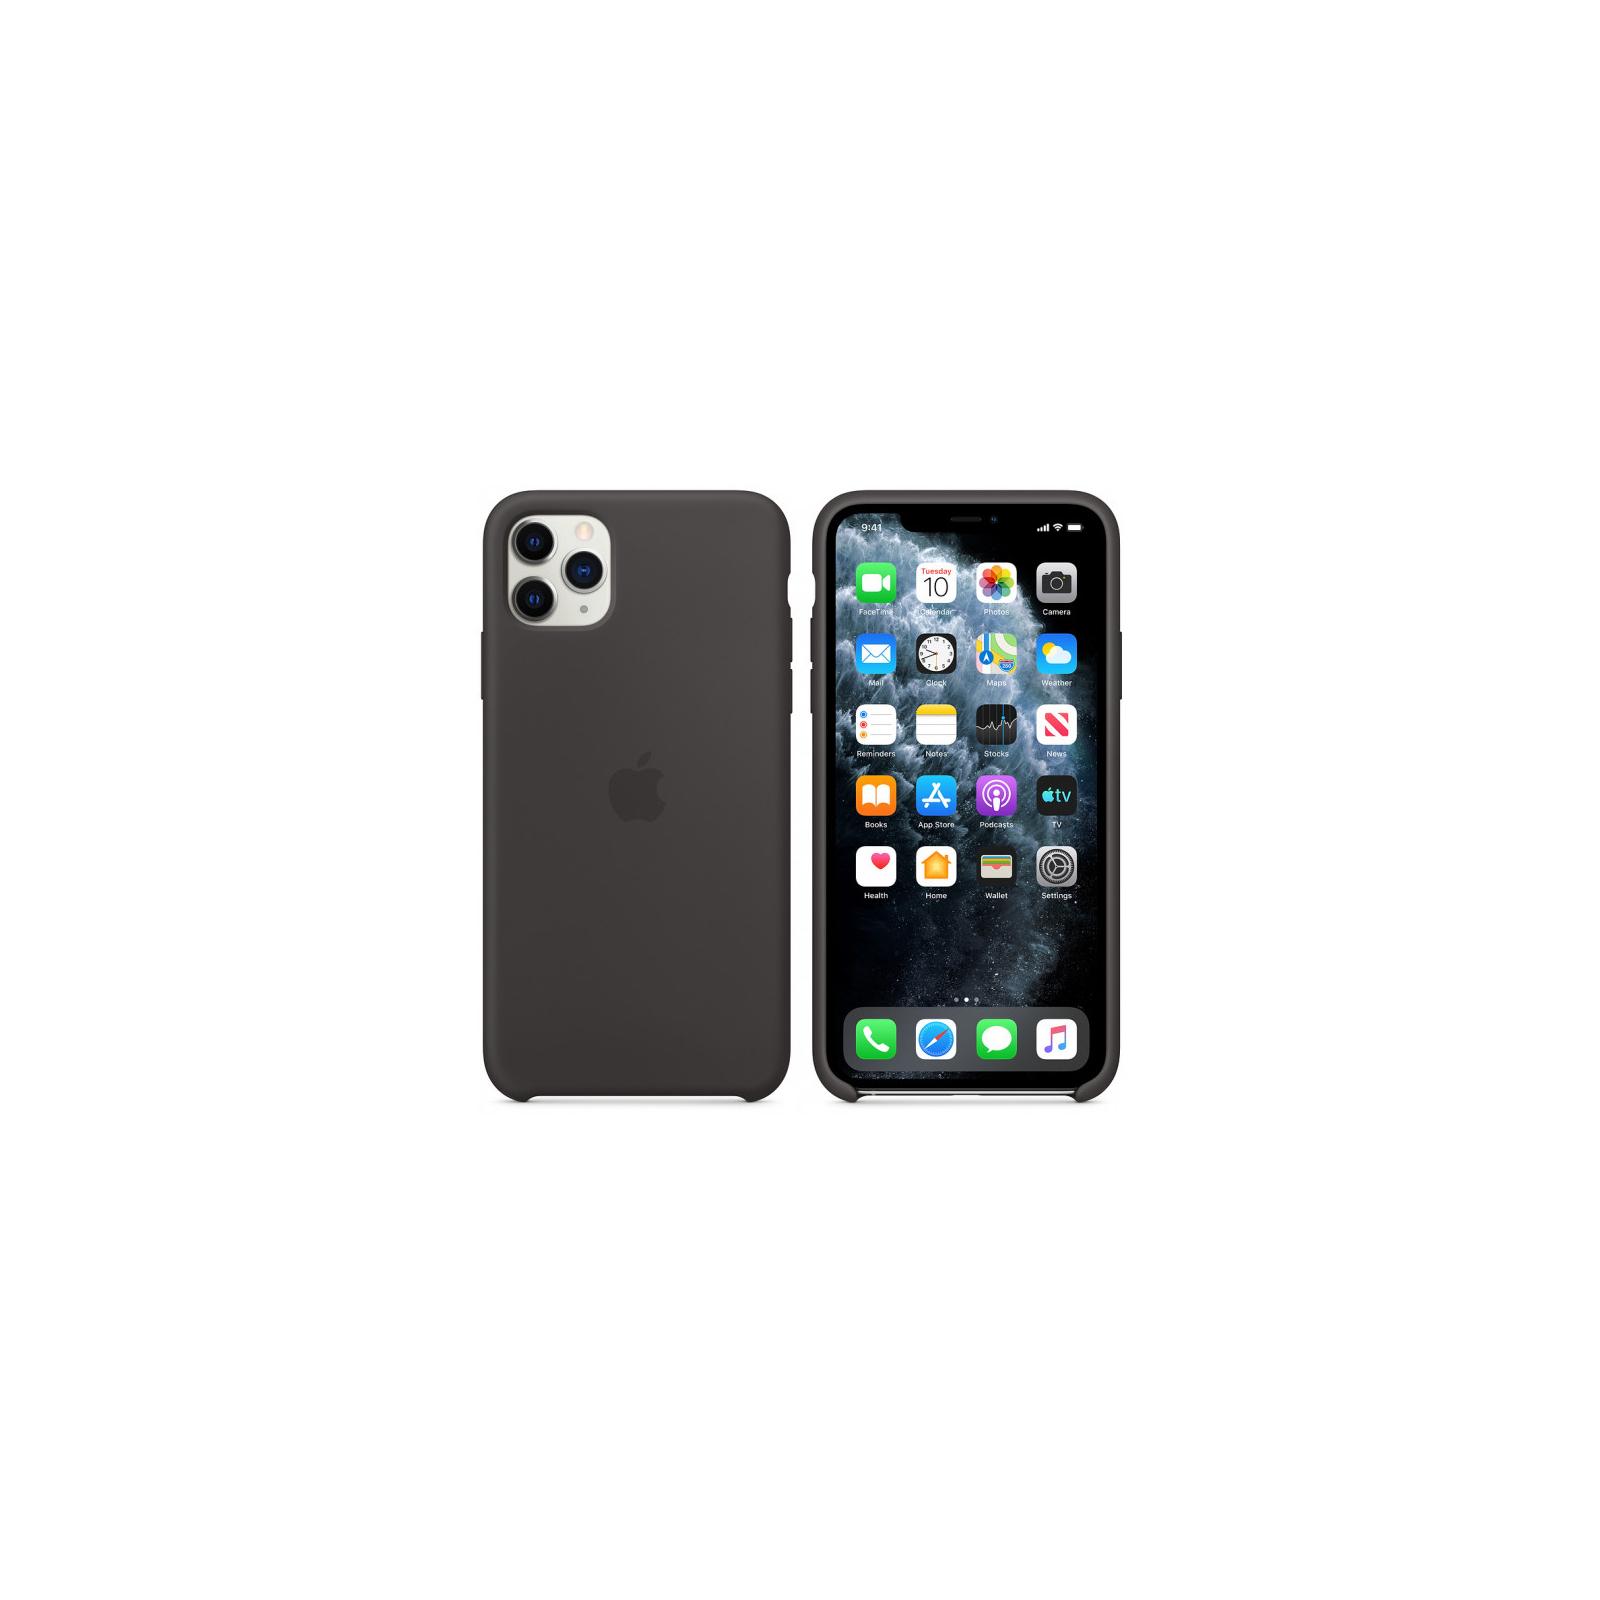 Чехол для моб. телефона Apple iPhone 11 Pro Max Silicone Case - Pine Green (MX012ZM/A) изображение 6